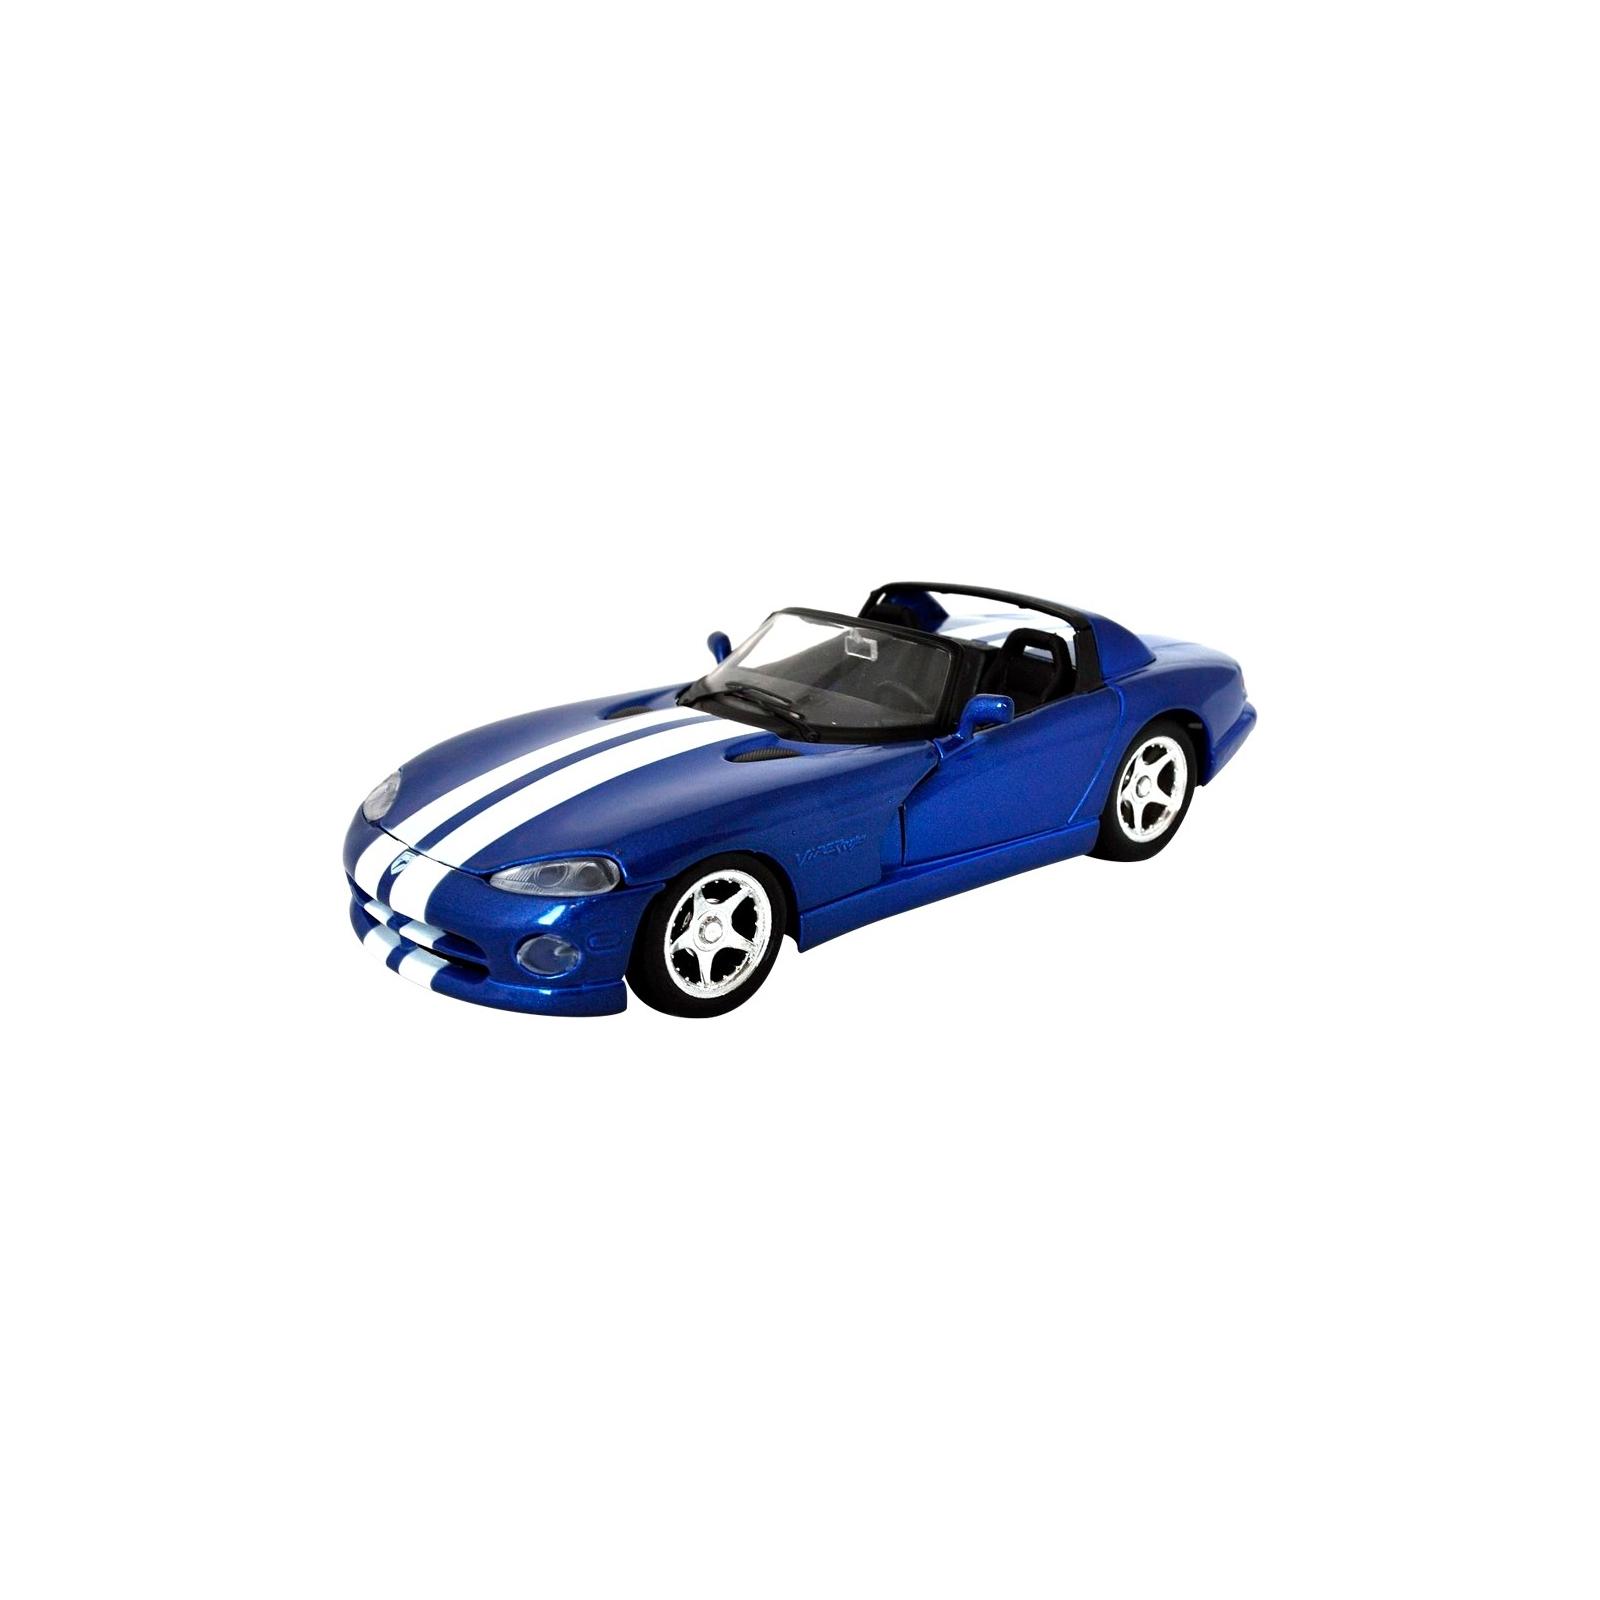 Машина Maisto Dodge Viper RT/10 '97 (1:24) синий (31932 blue)